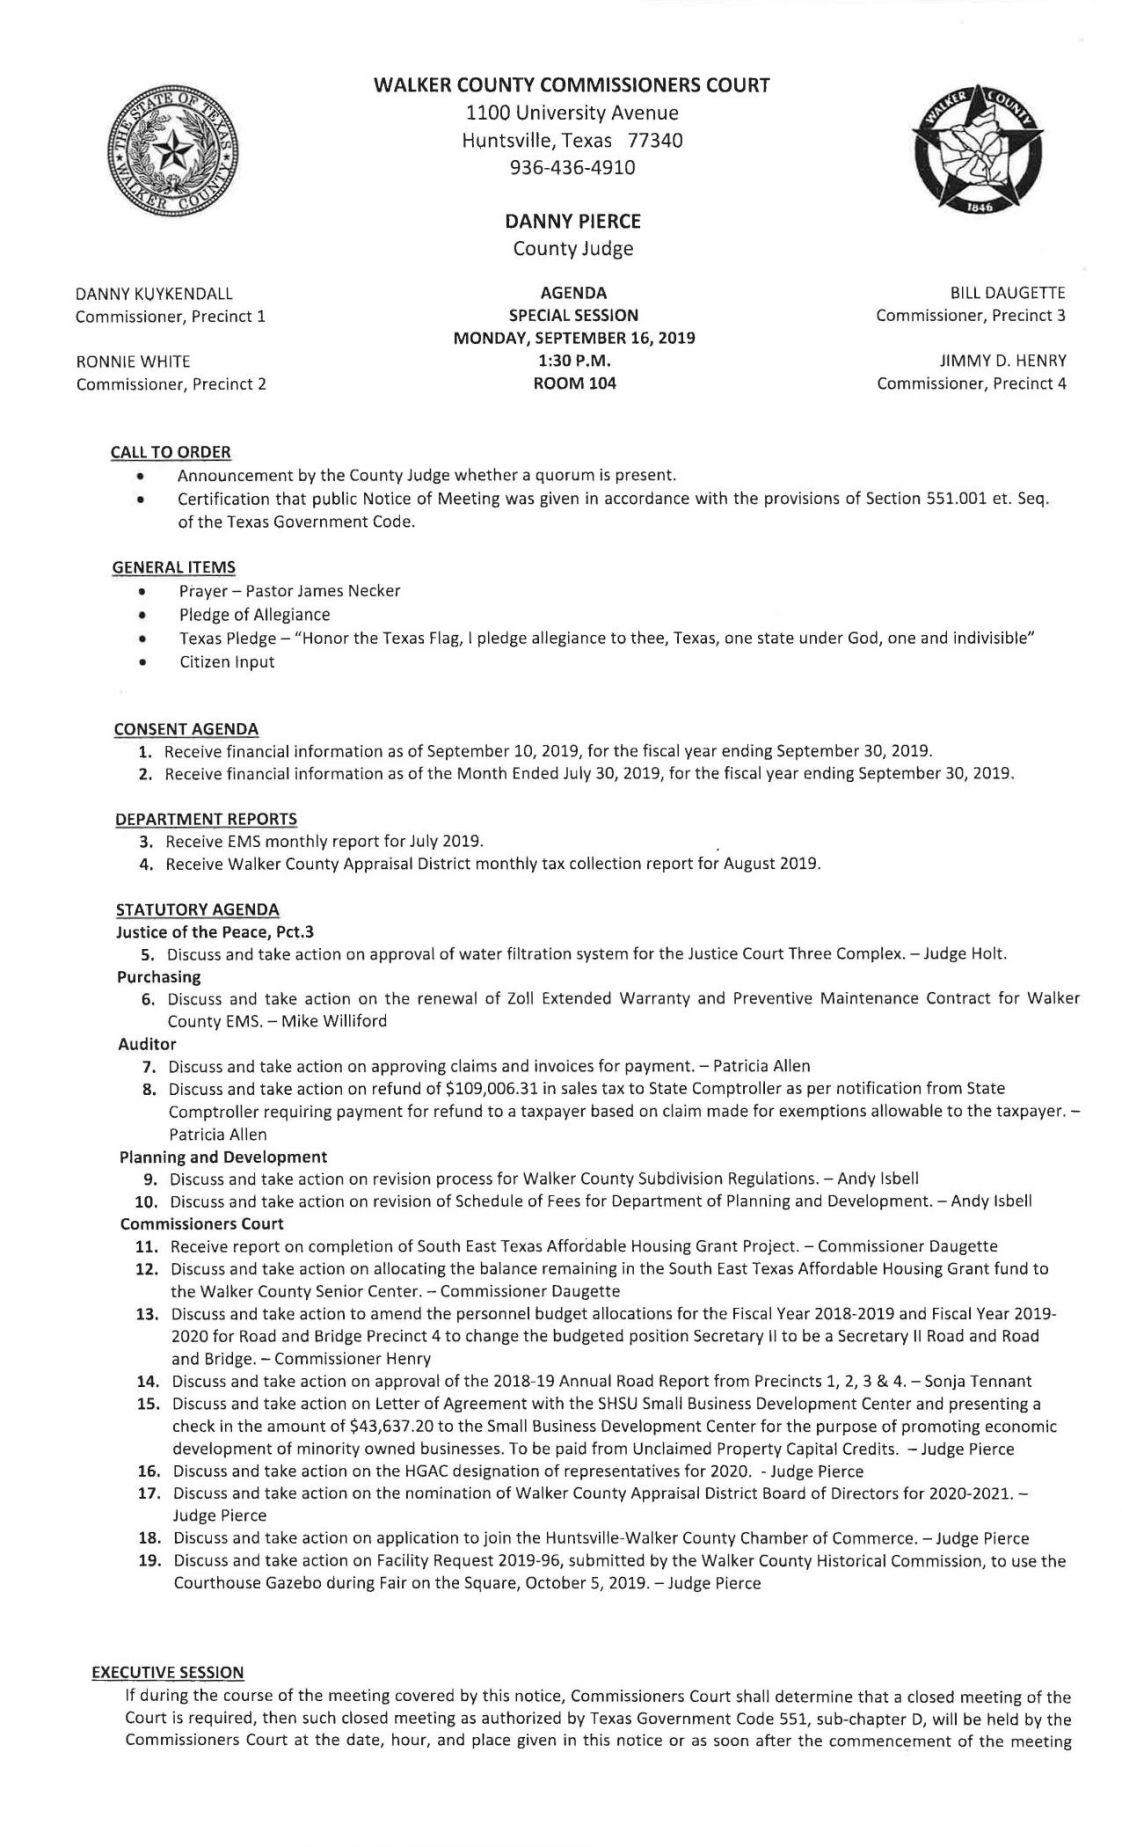 Commissioners Court agenda - Sept. 16